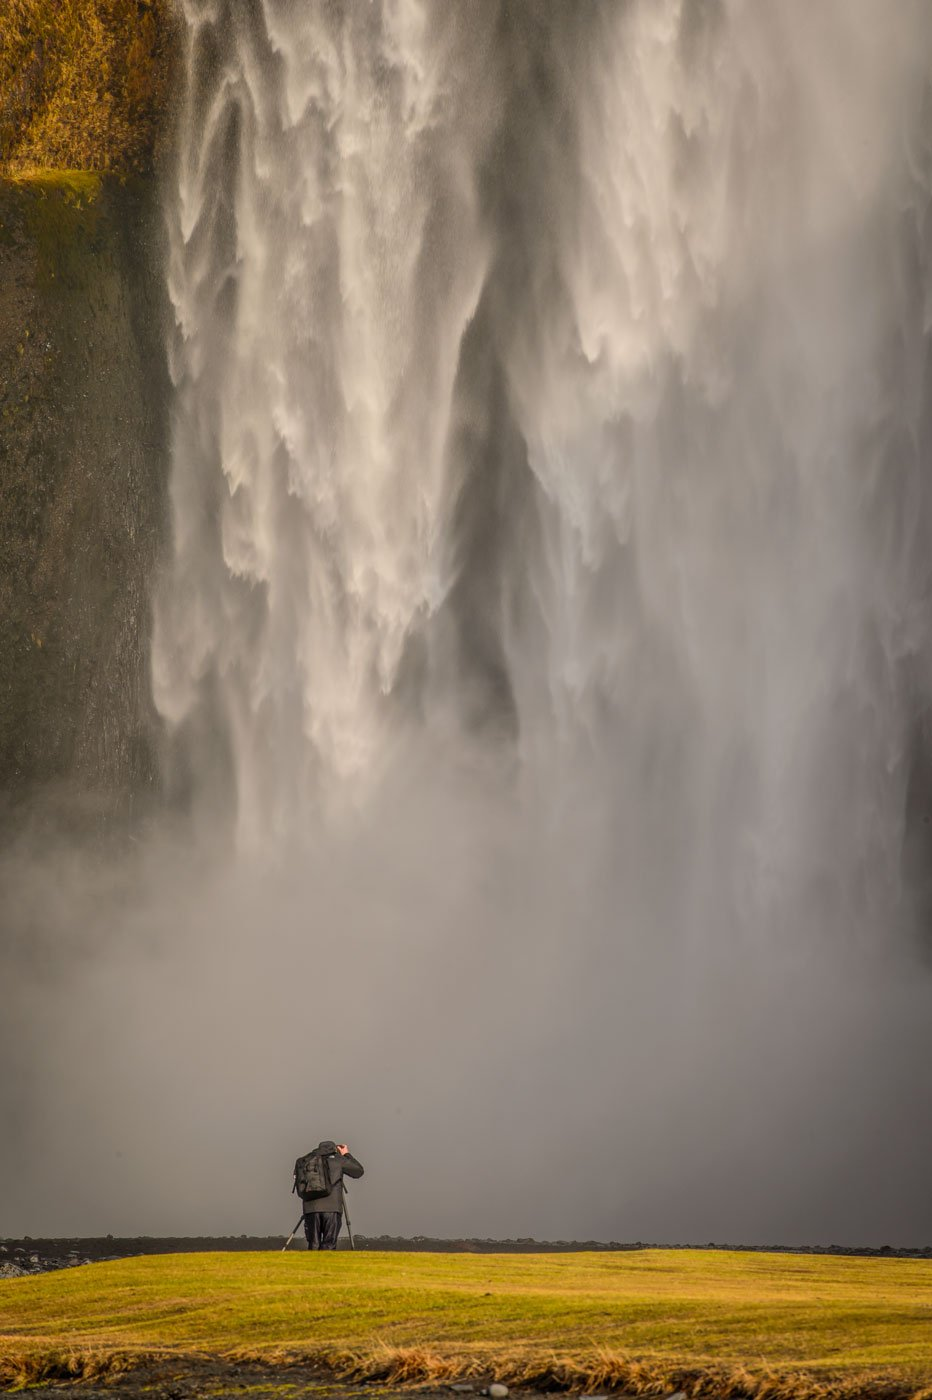 Путешествия, Исландия, остров, водопад, Анна Яценко